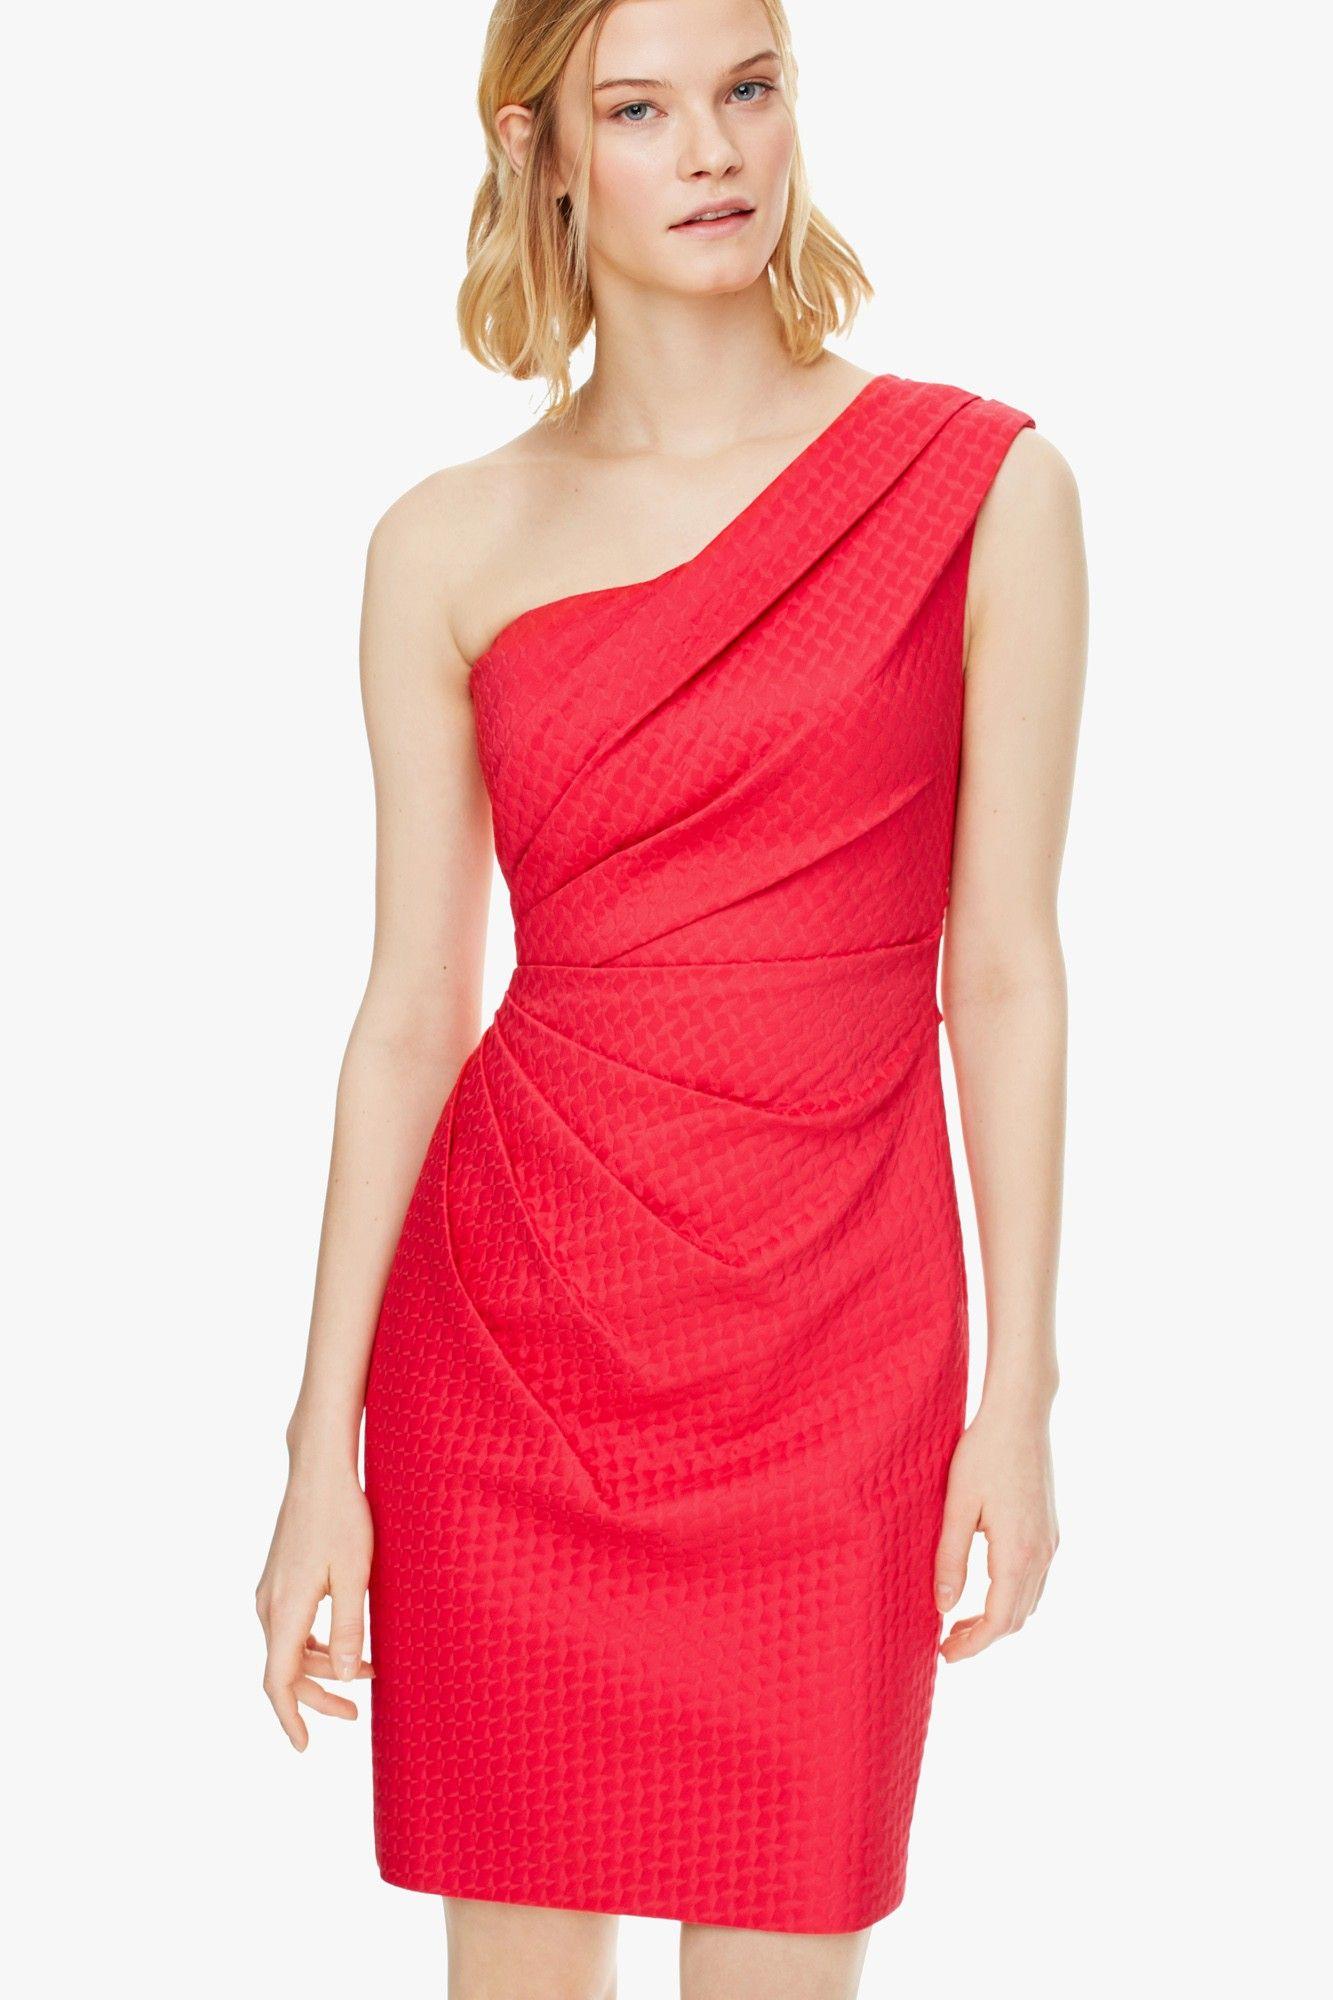 Vestido frunce asim trico vestidos adolfo dominguez for Adolfo dominguez outlet online